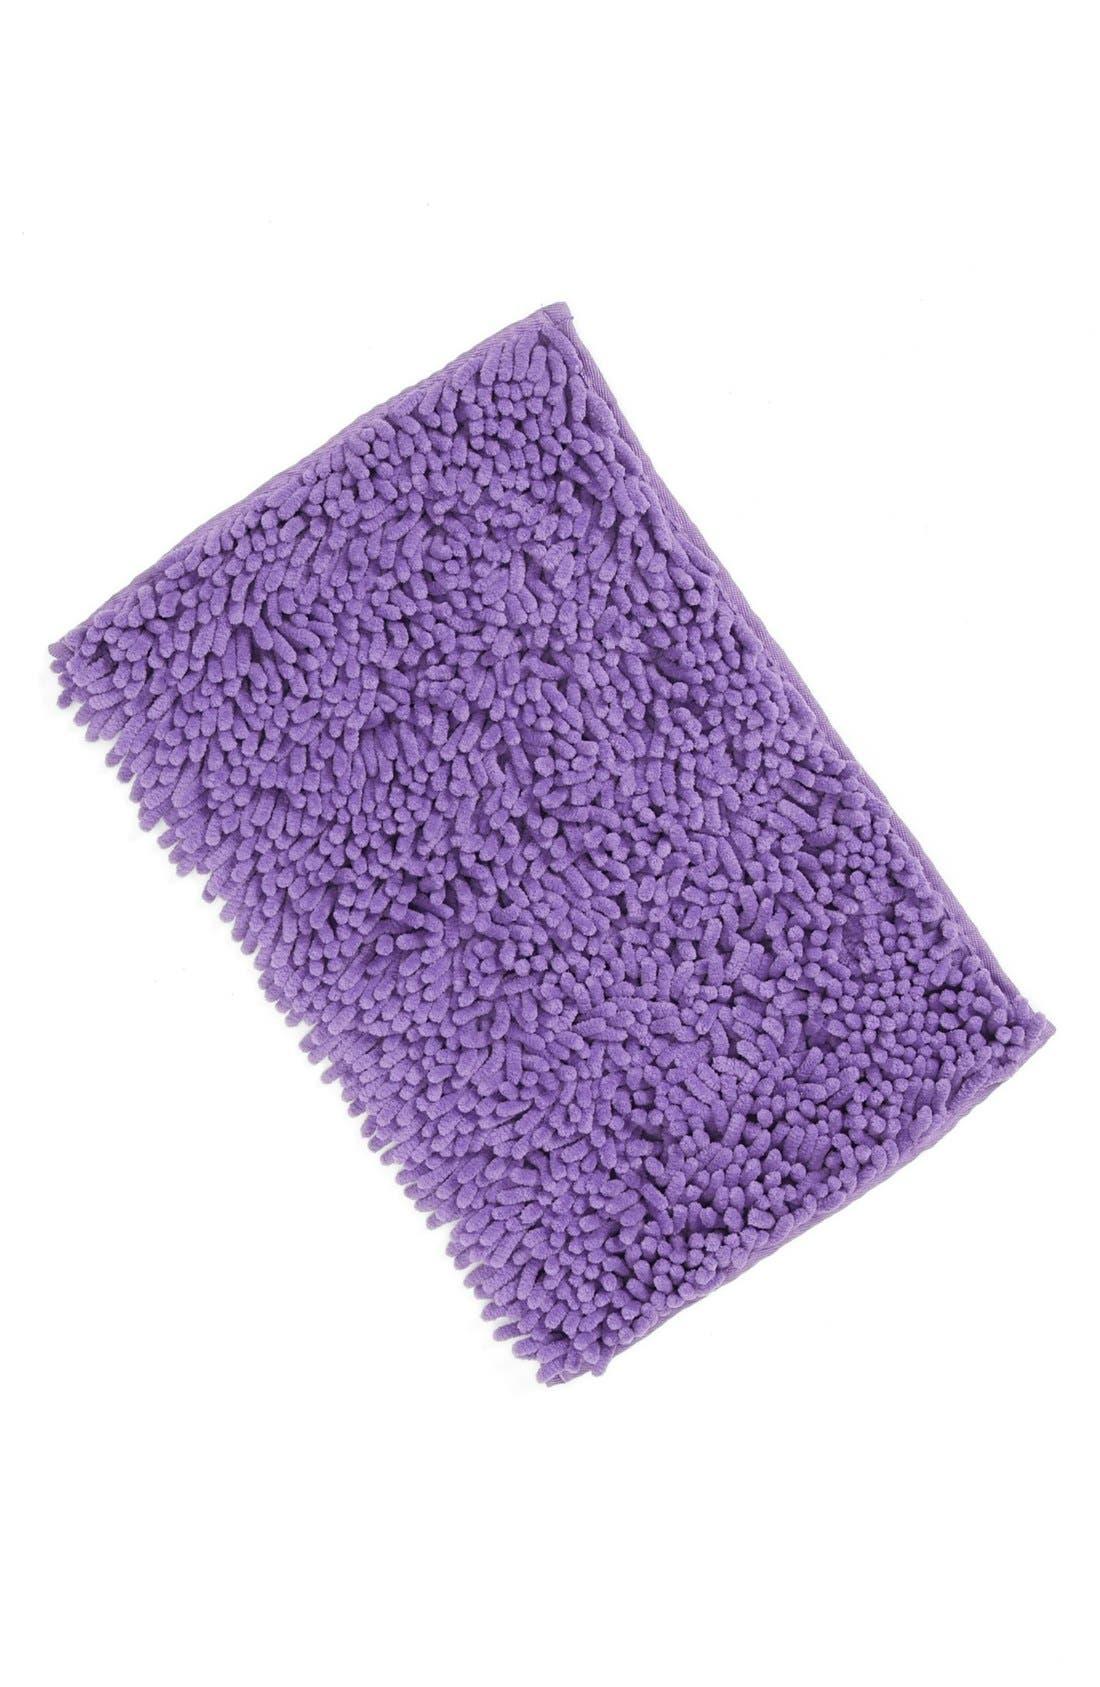 Alternate Image 1 Selected - 3C4G Shaggy Locker Carpet